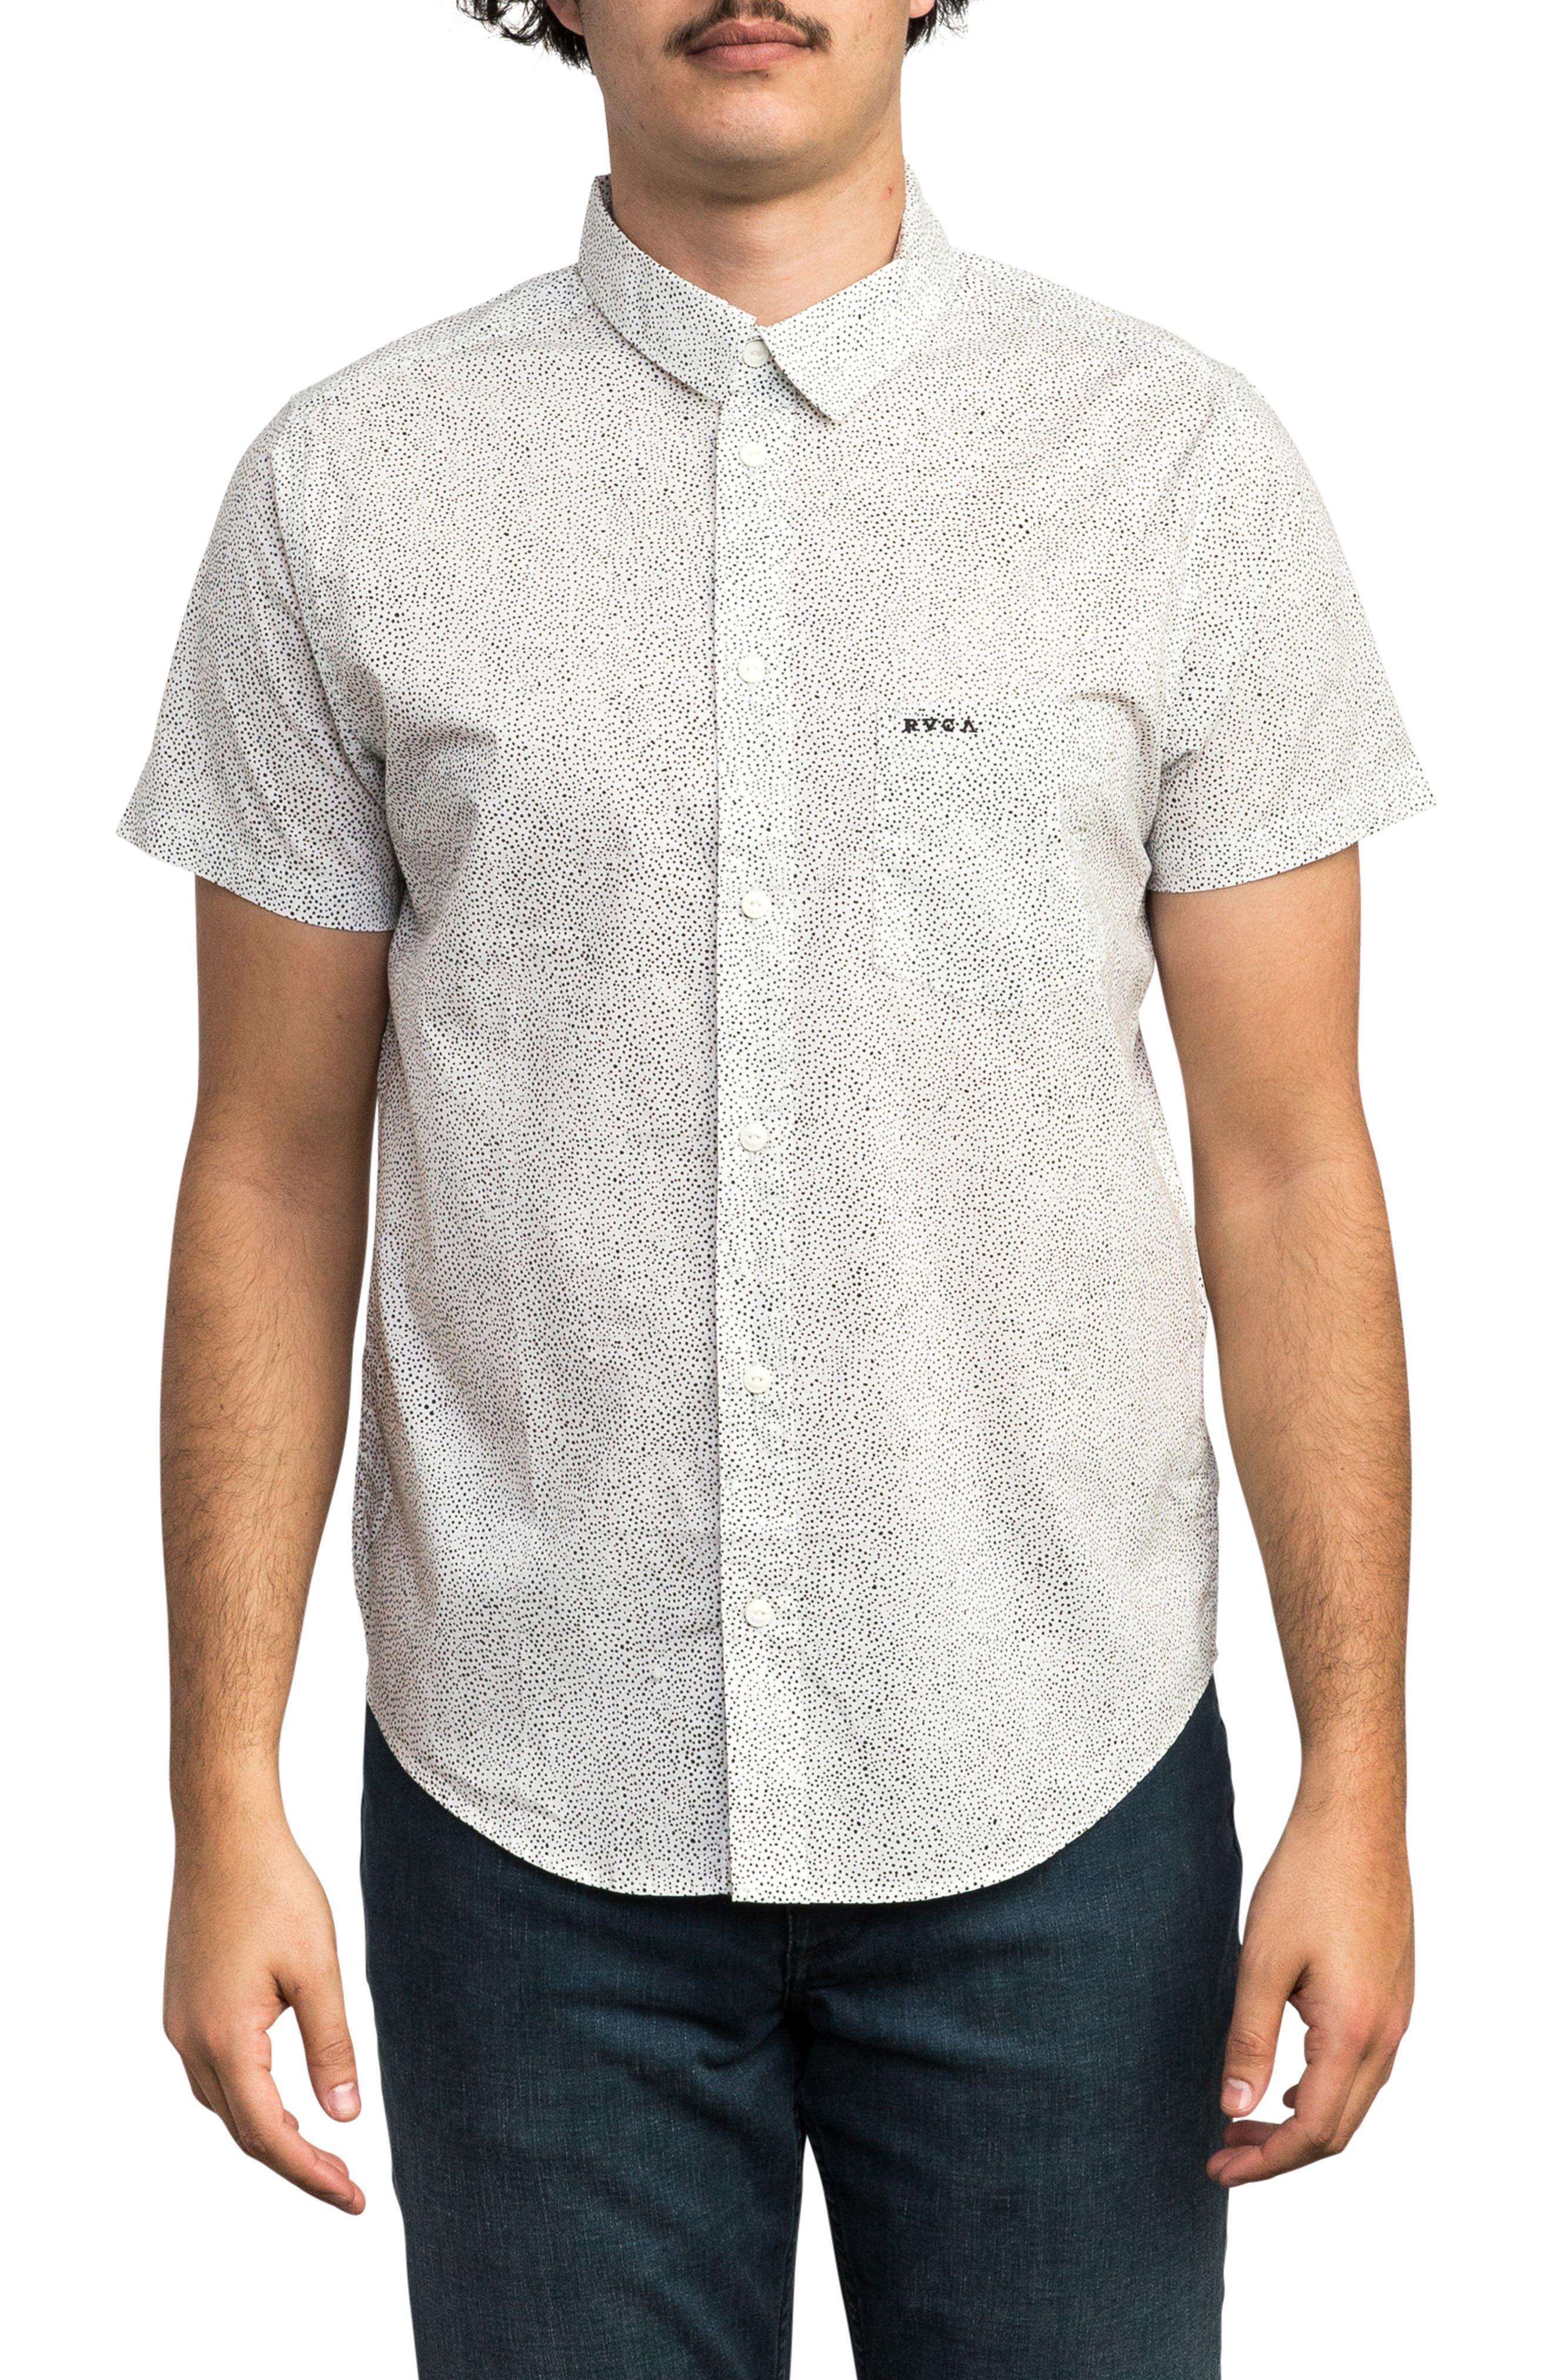 Benji Short Sleeve Woven Shirt,                             Main thumbnail 1, color,                             ANTIQUE WHITE